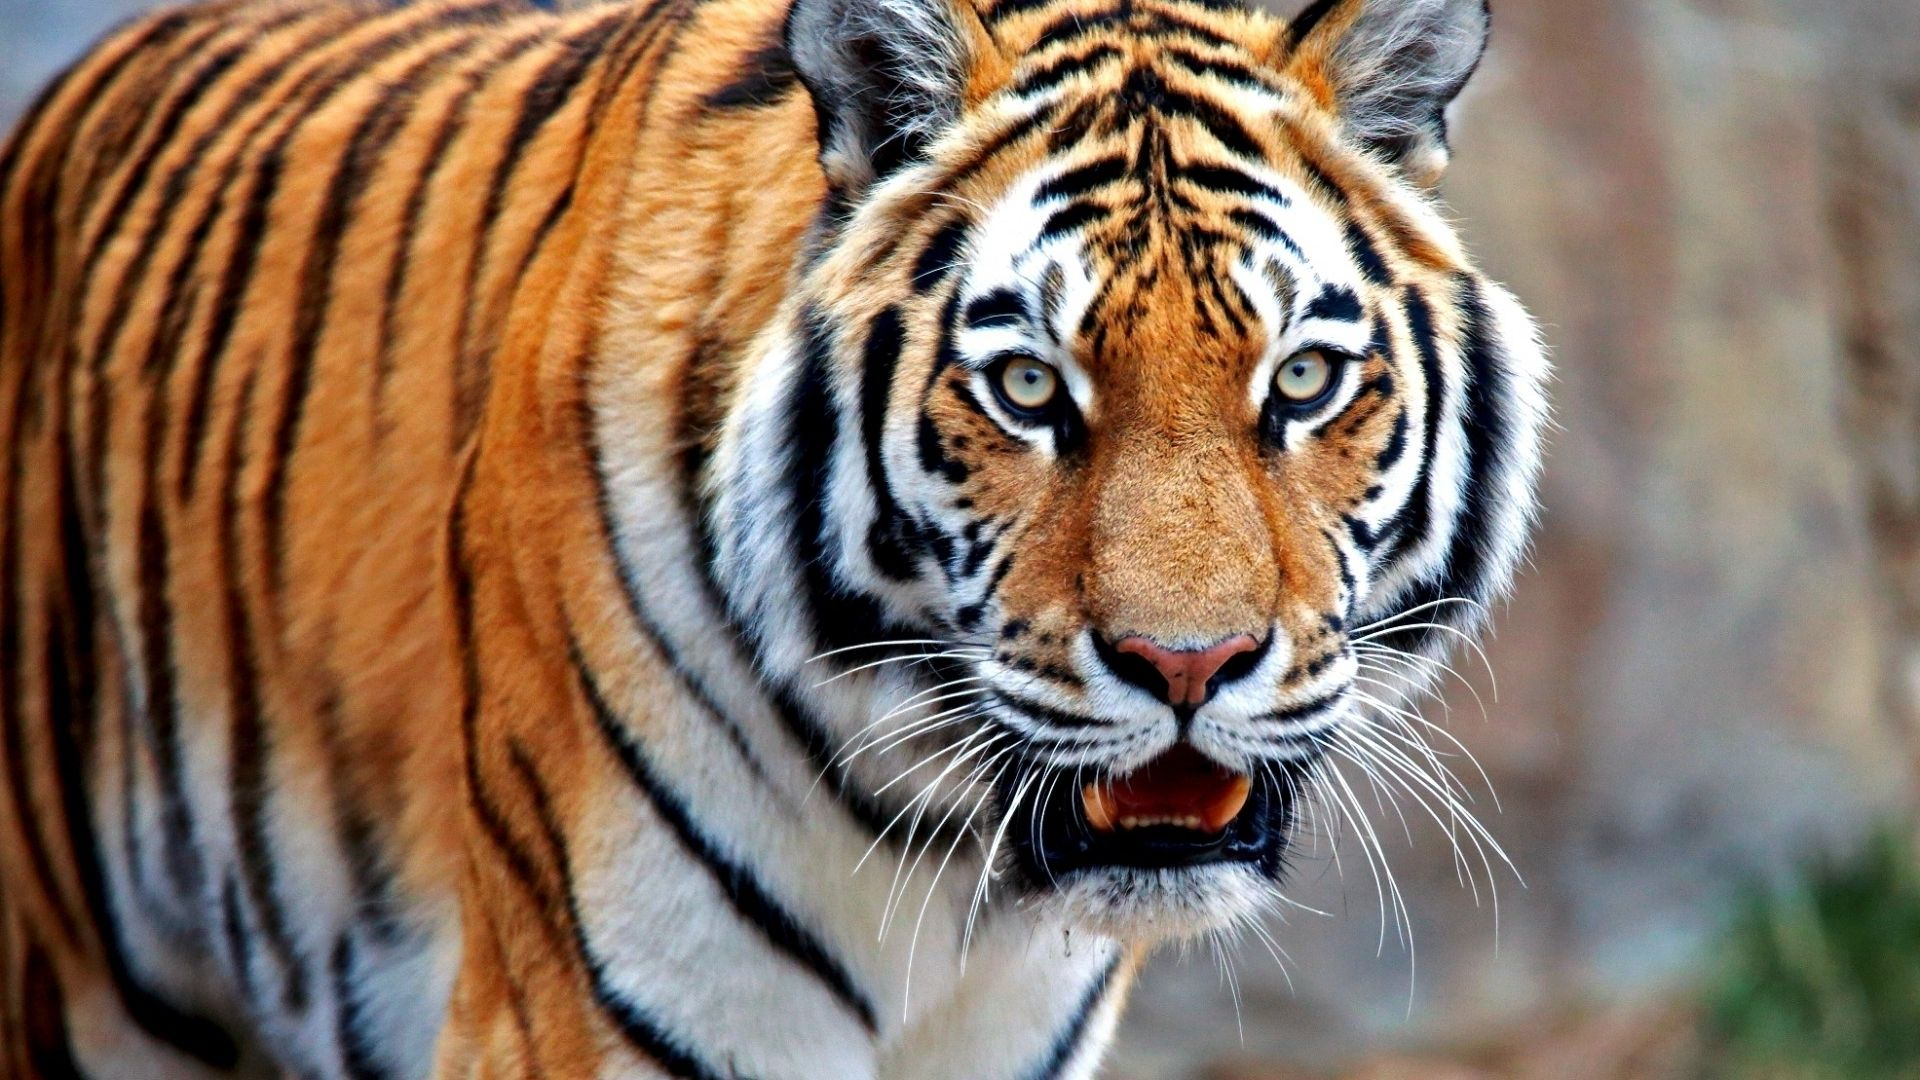 Tiger is hot, 1080p Wallpaper